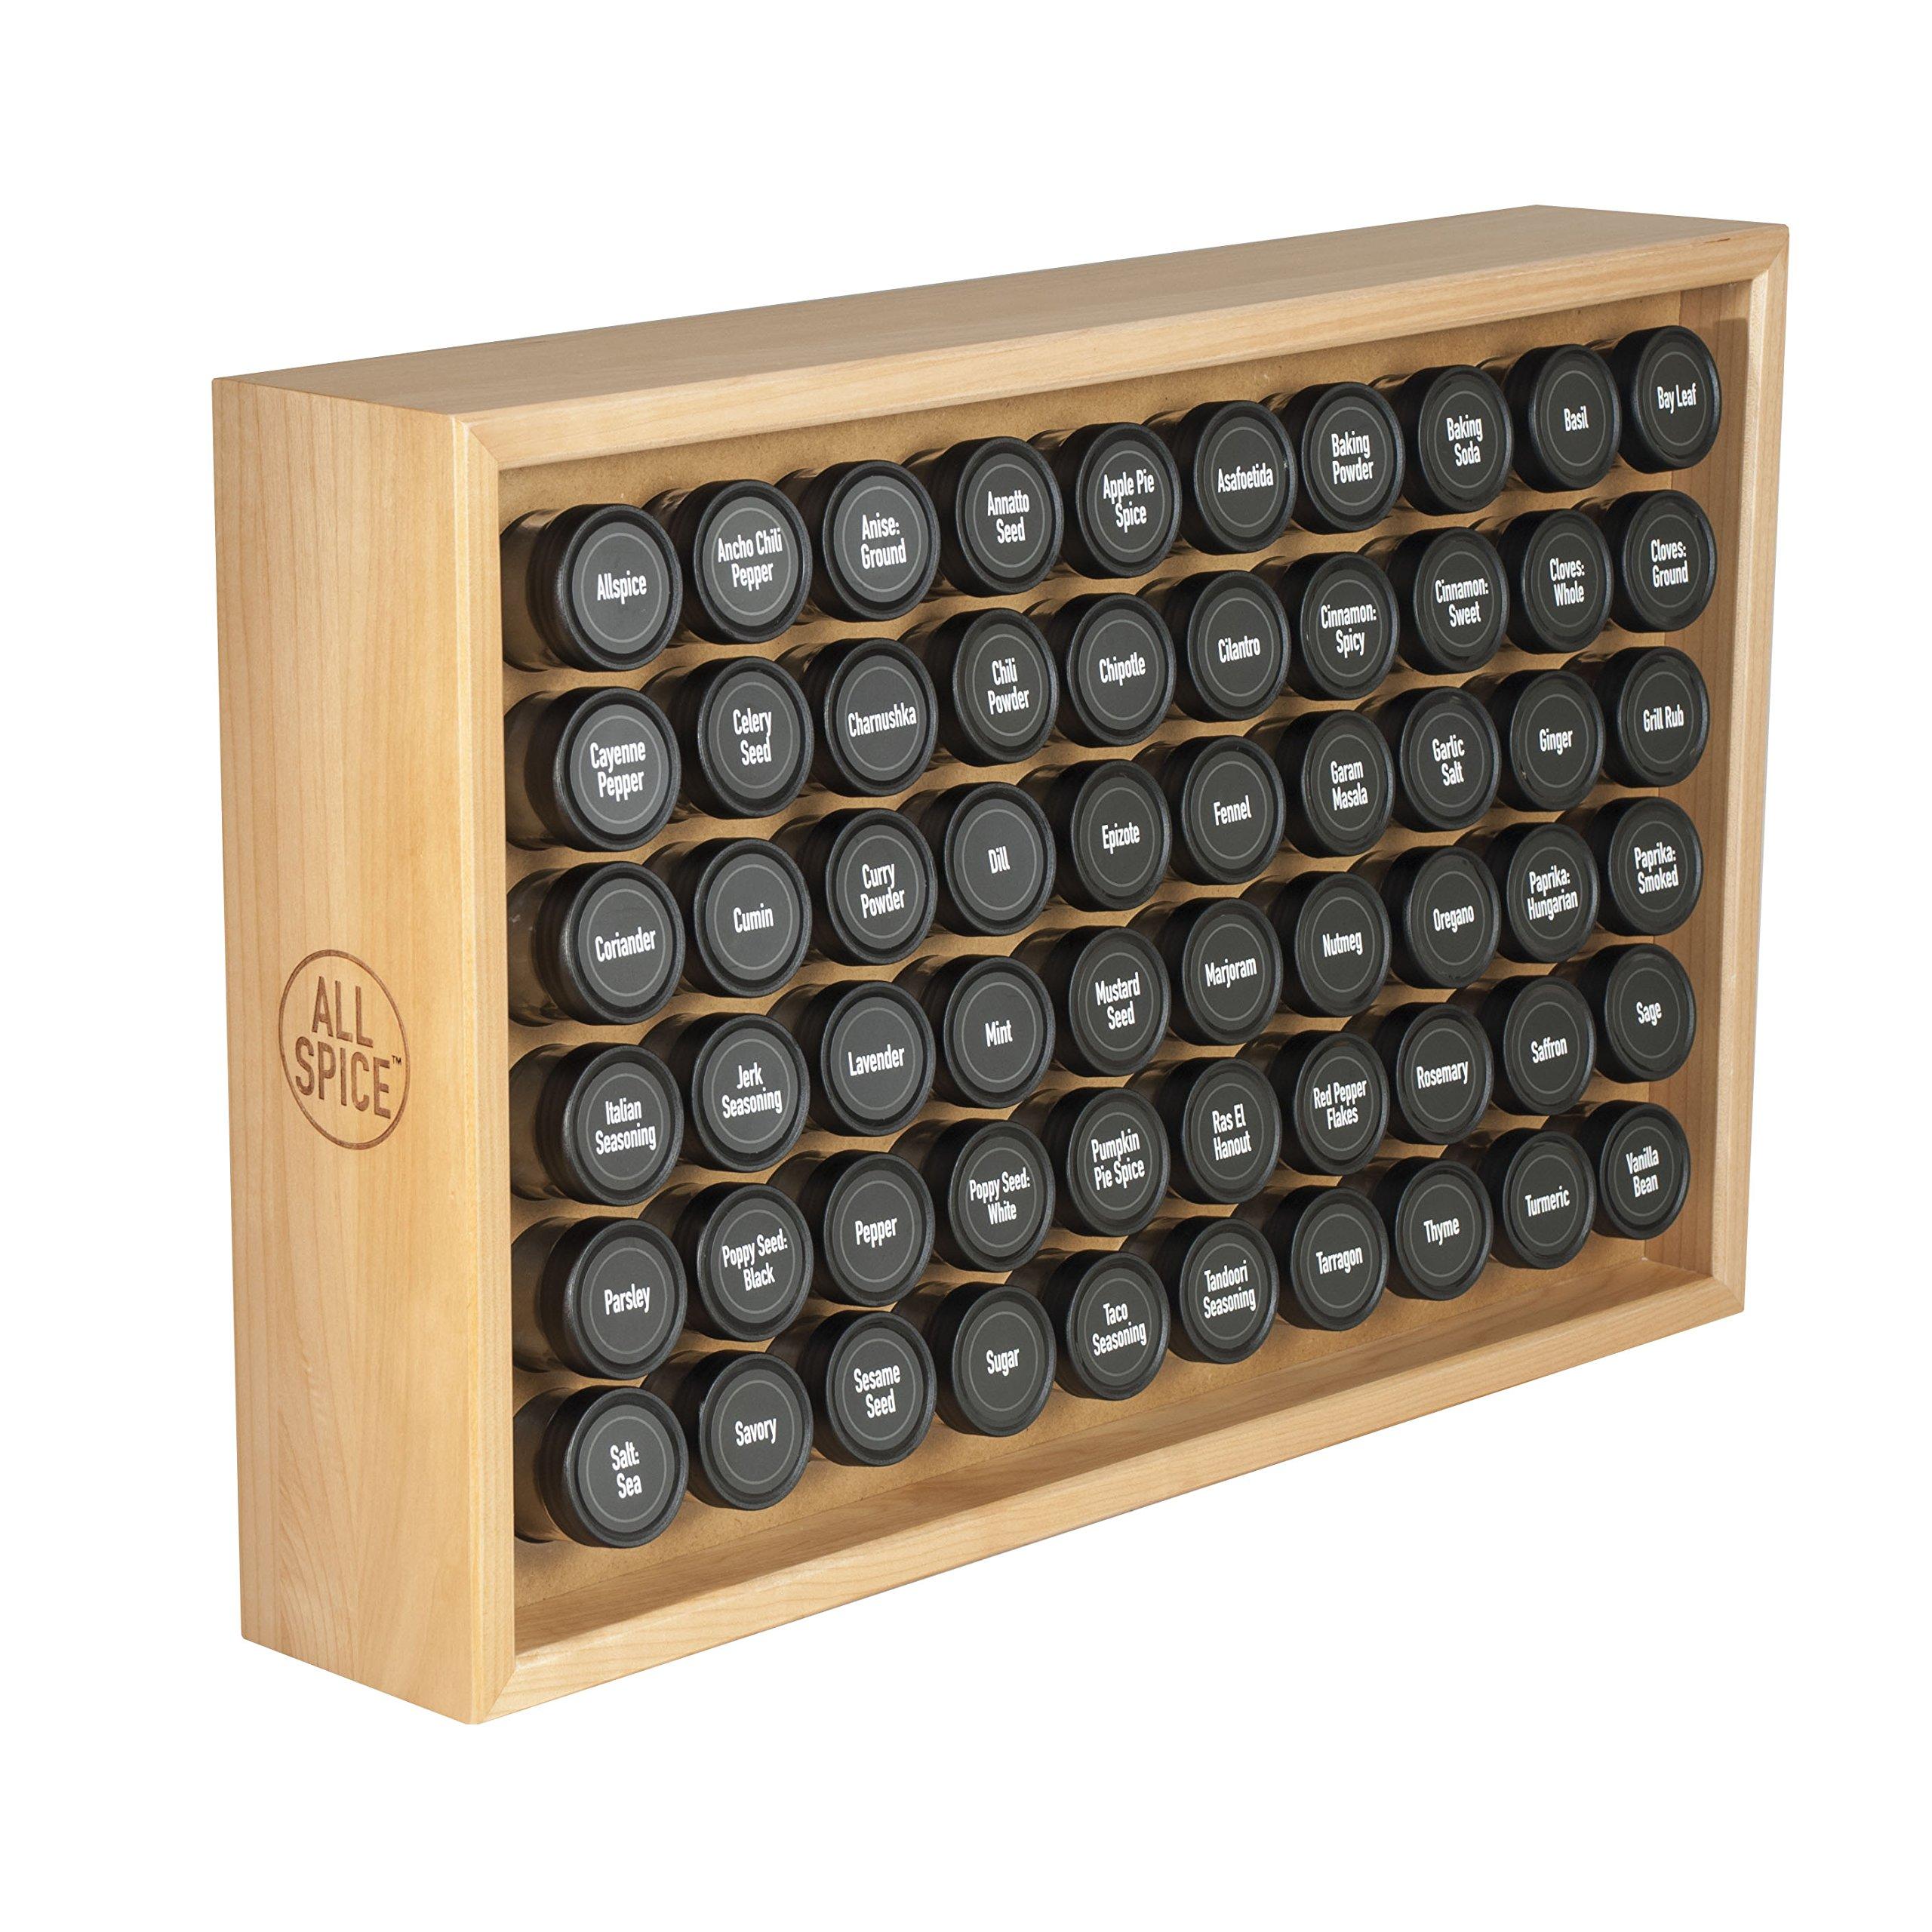 AllSpice Wooden Spice Rack, Includes 60 4oz Jars- Maple